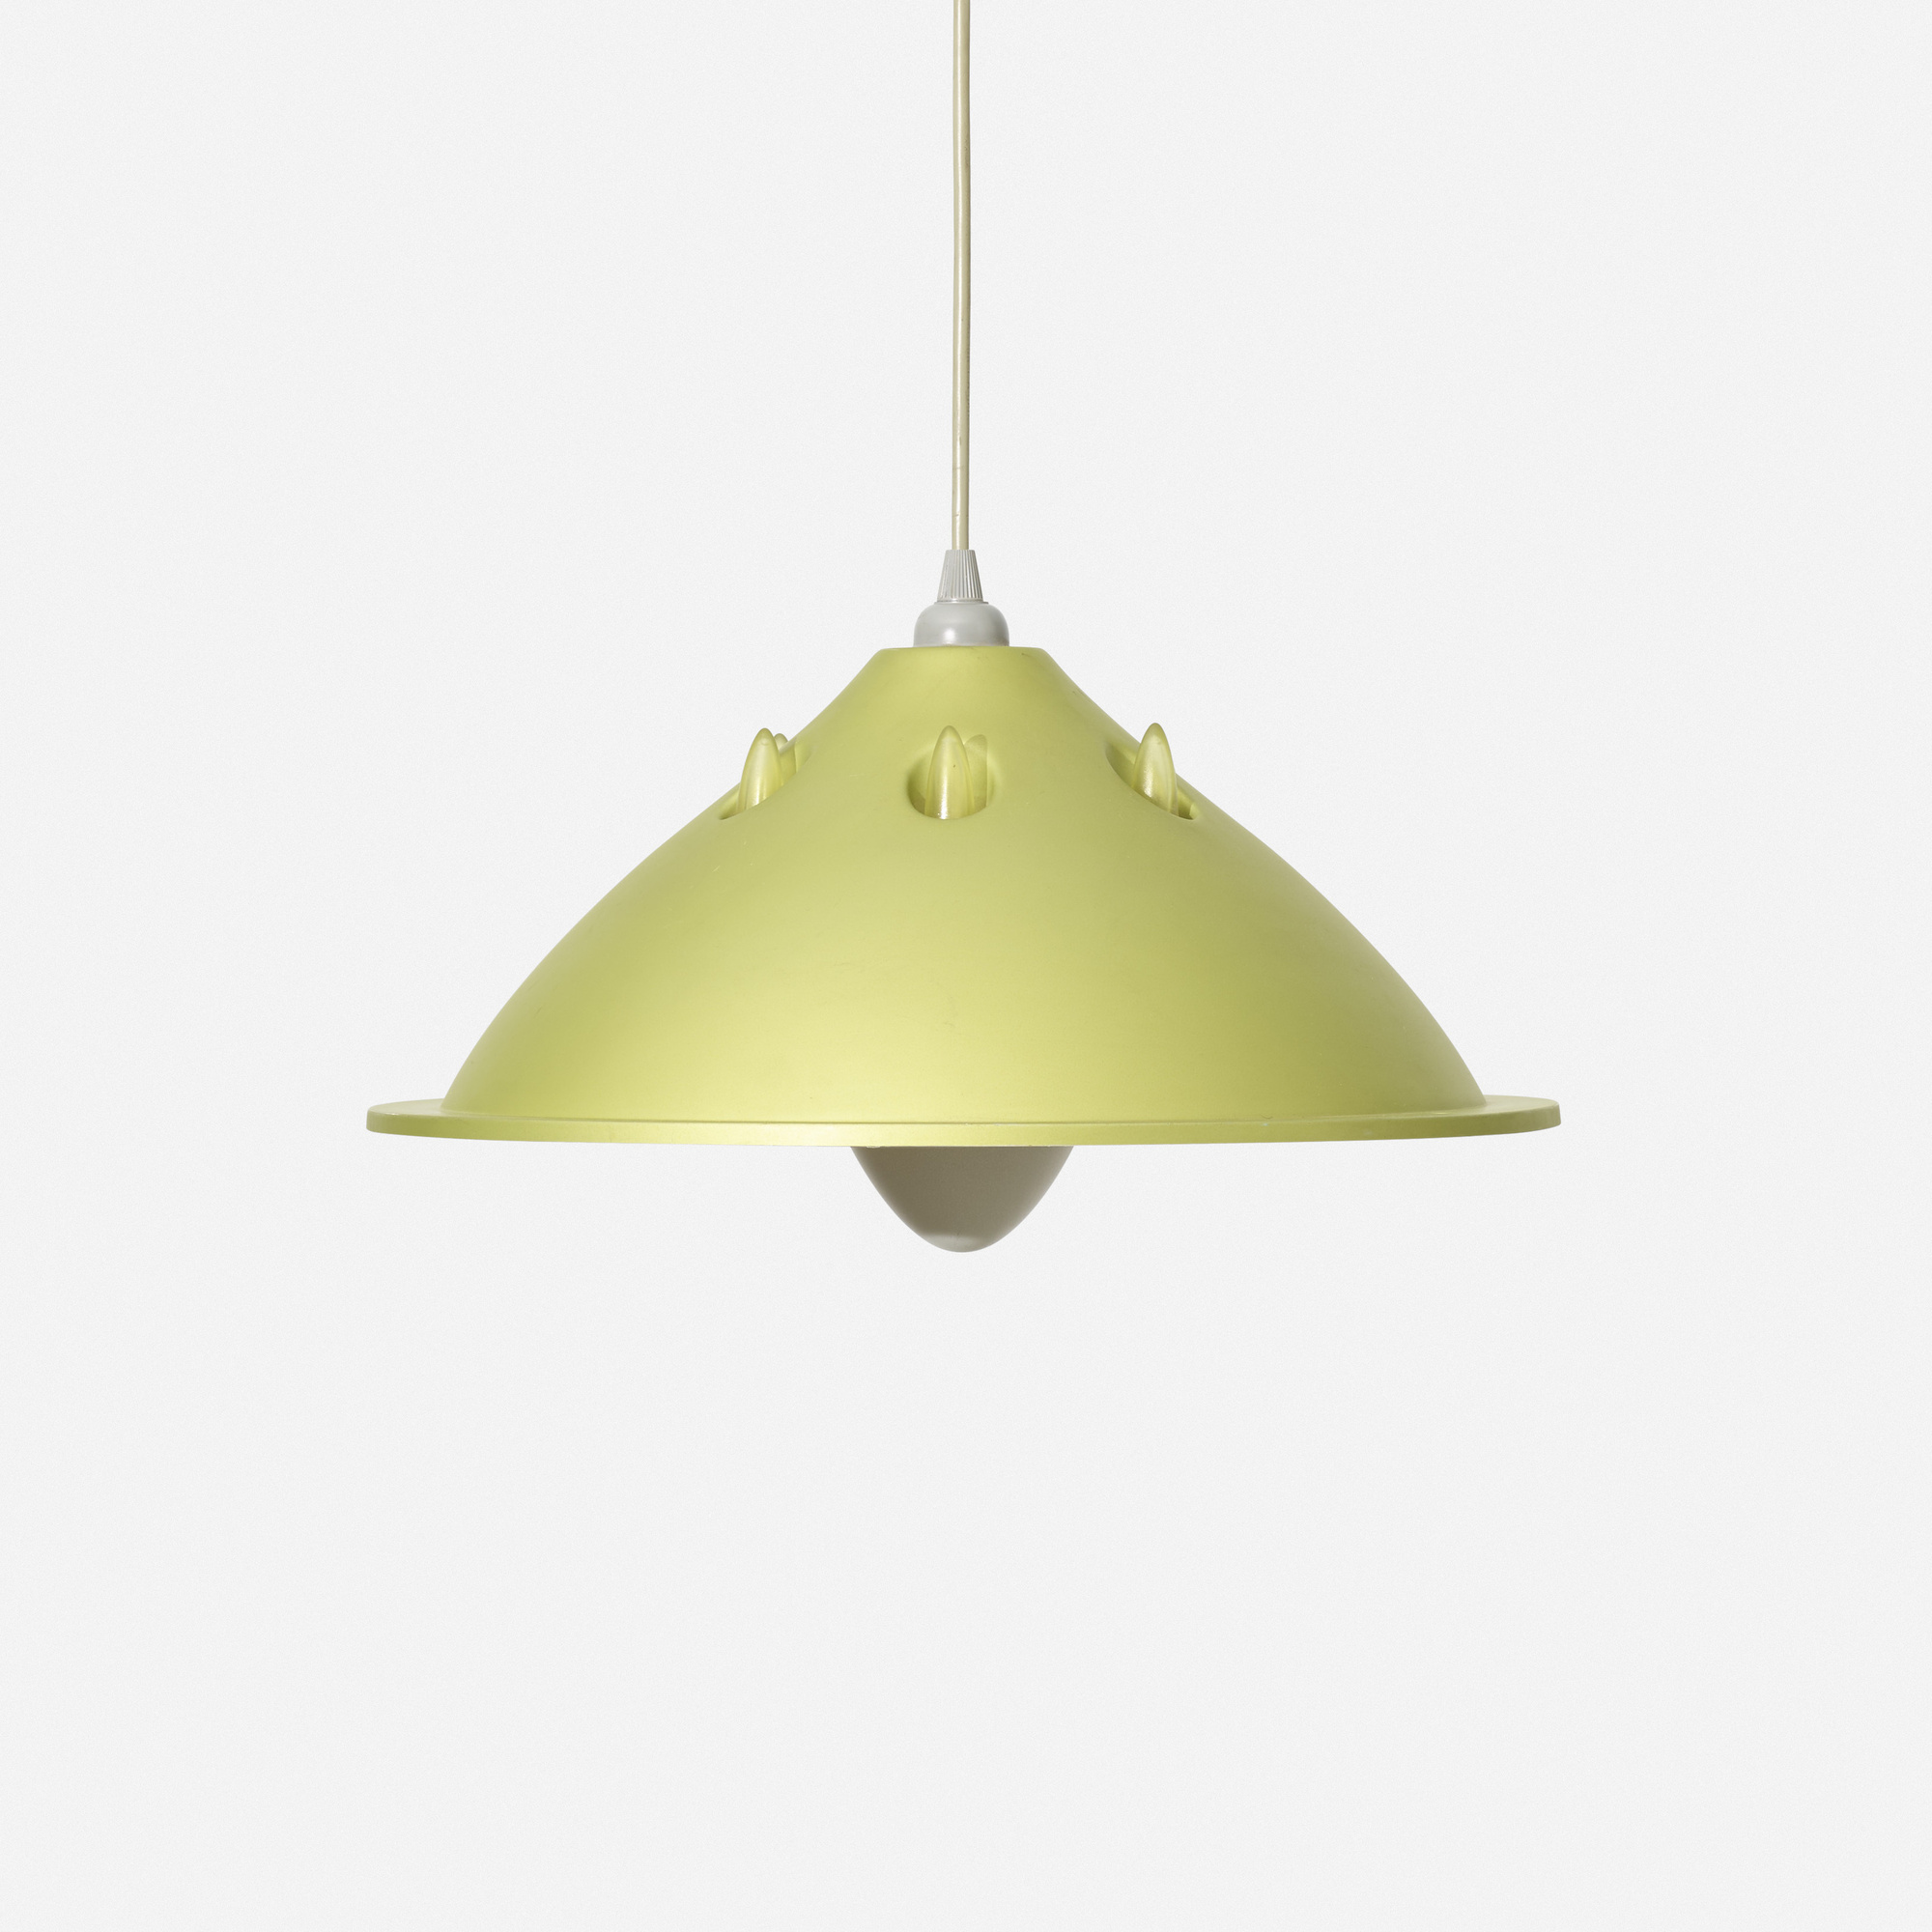 261: Philippe Starck / Light Lite (1 of 1)